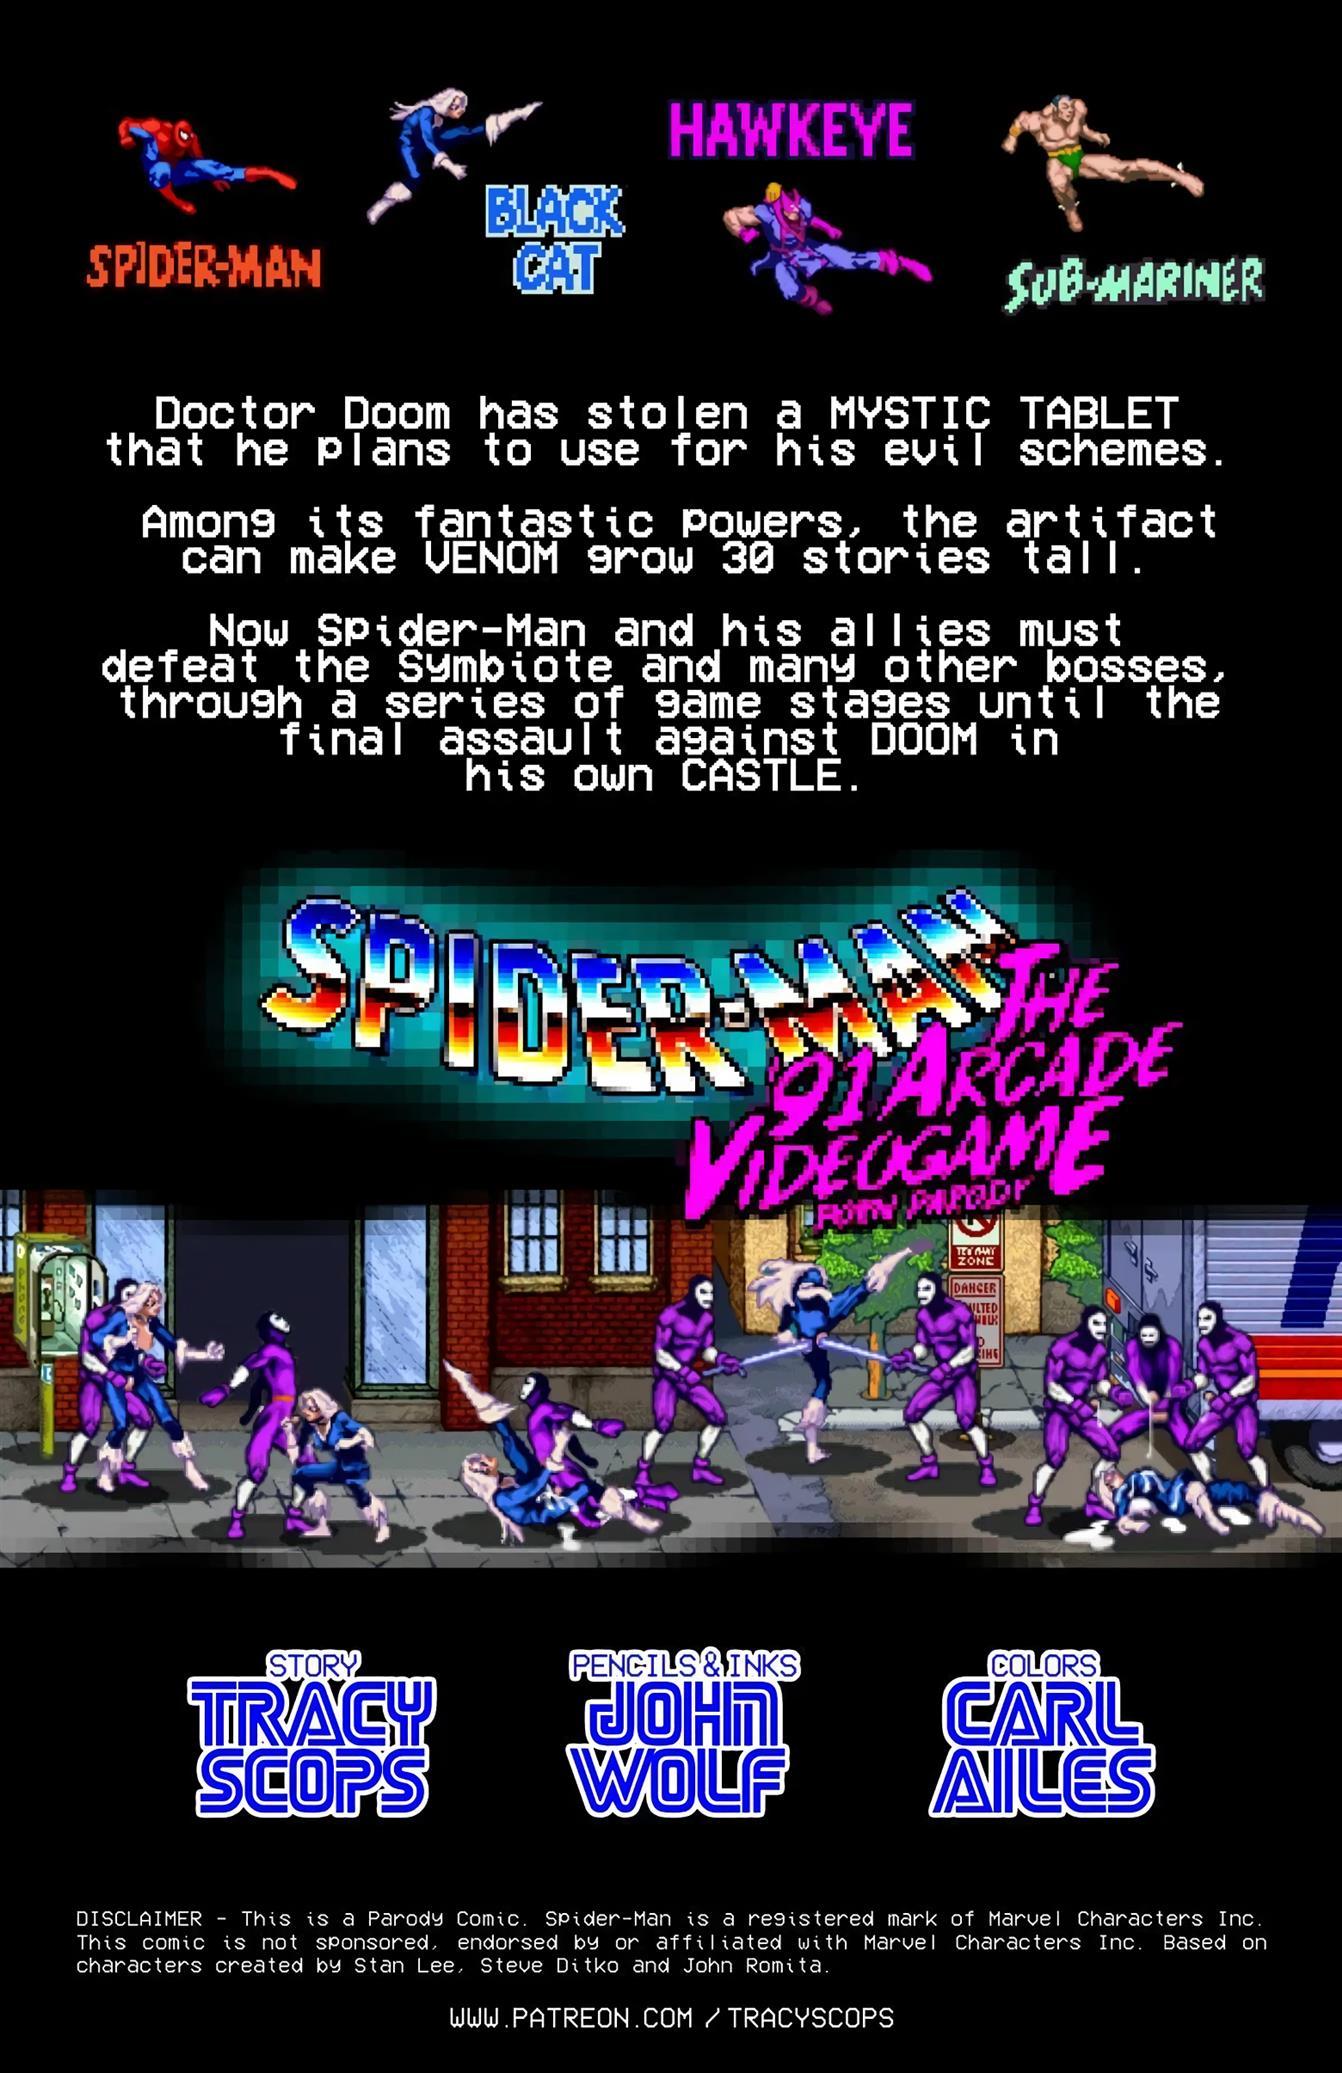 John Wolf - Spider-Man the '91 Arcade Video Game - Foto 2